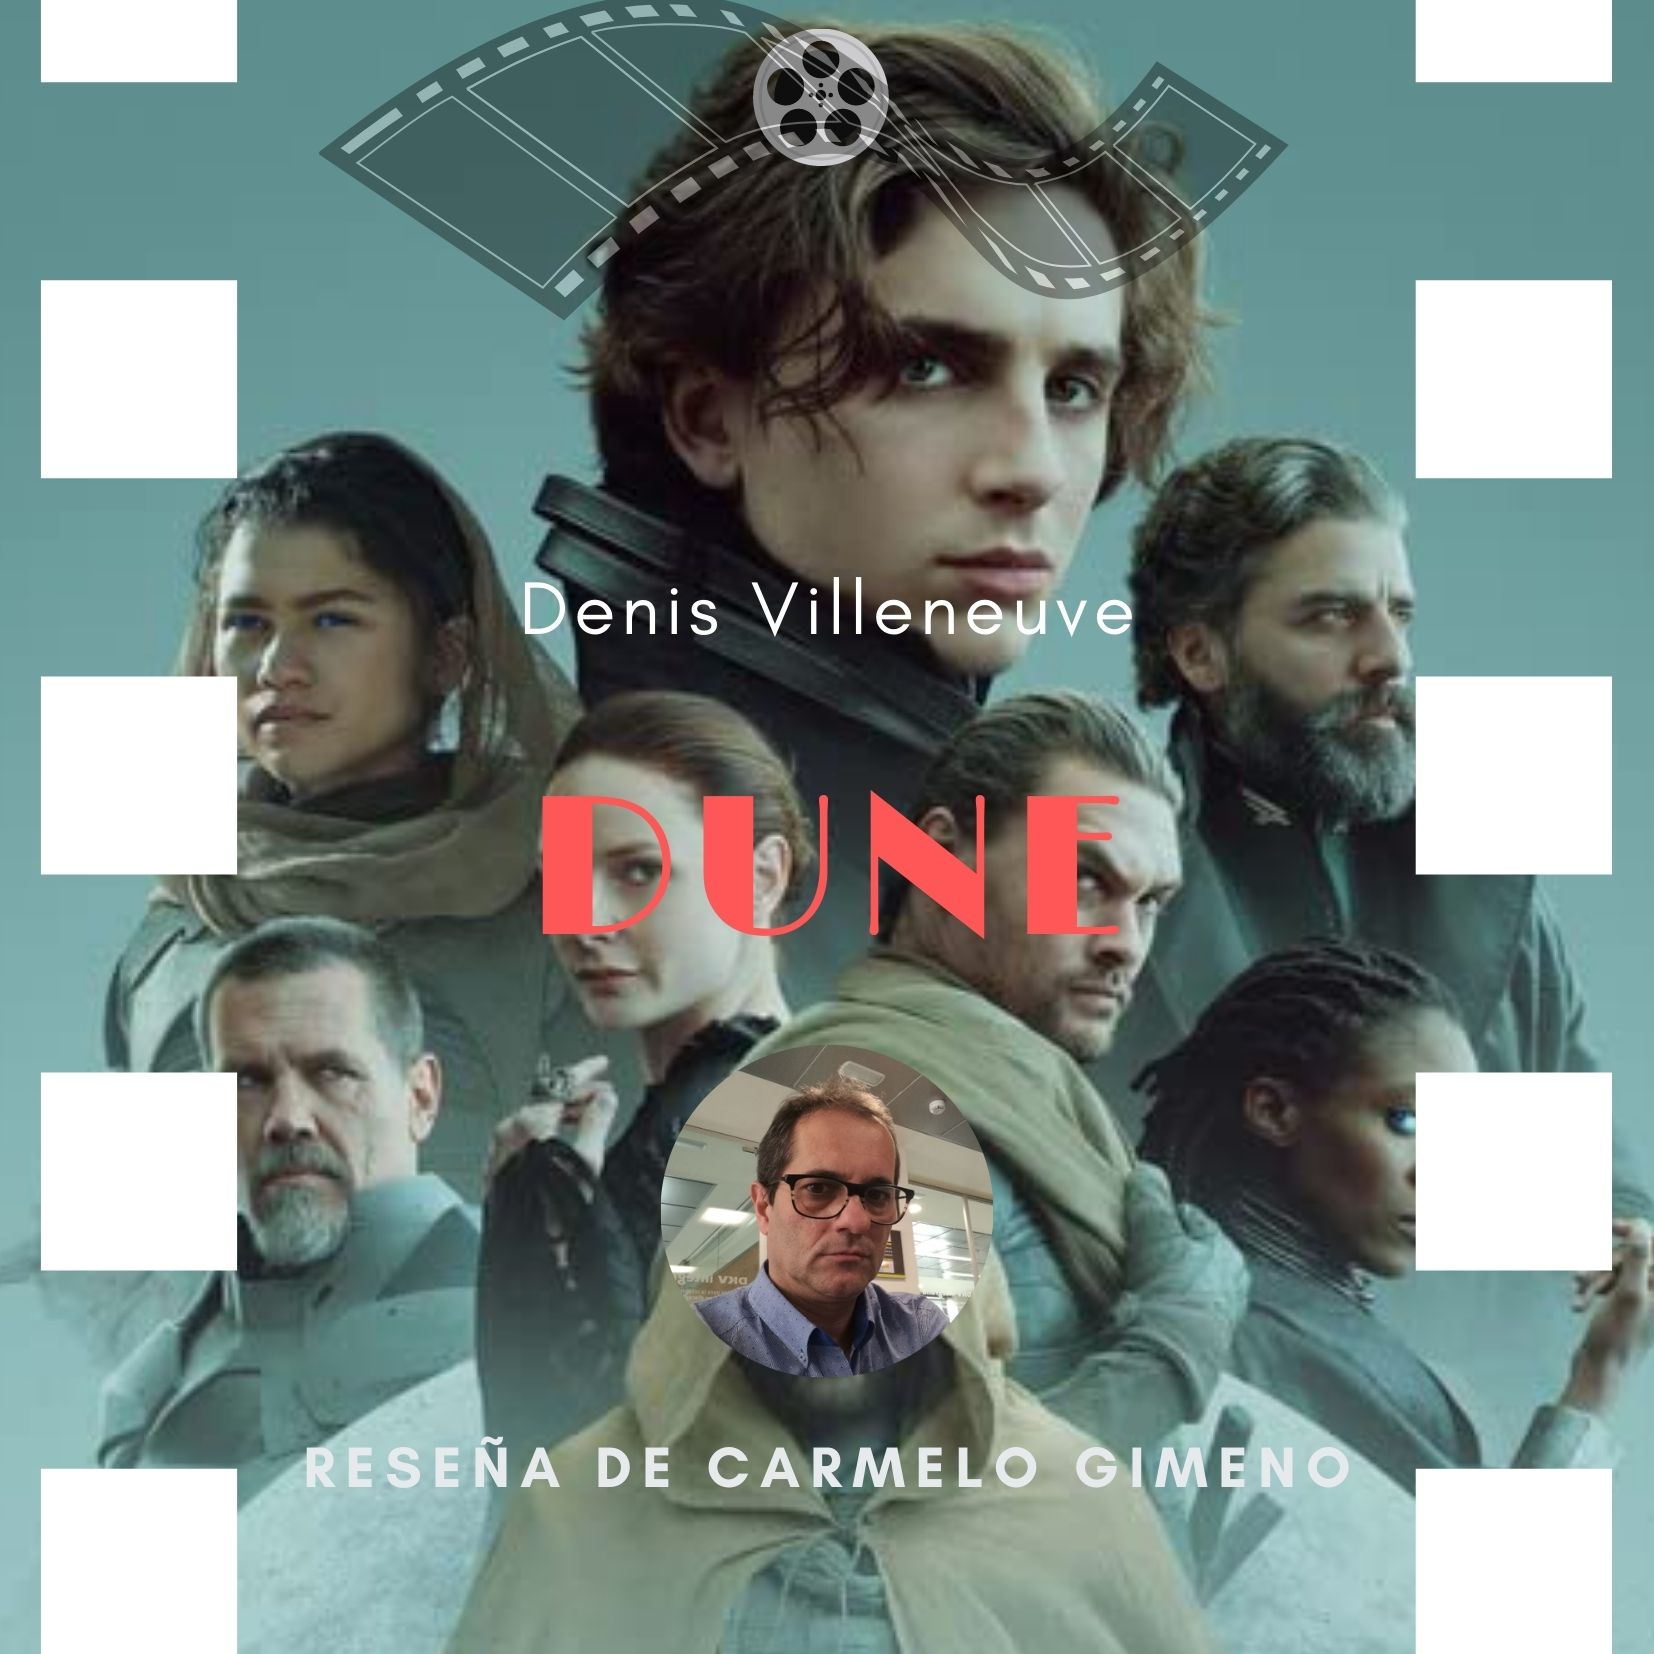 Dune de Denis Villeneuve